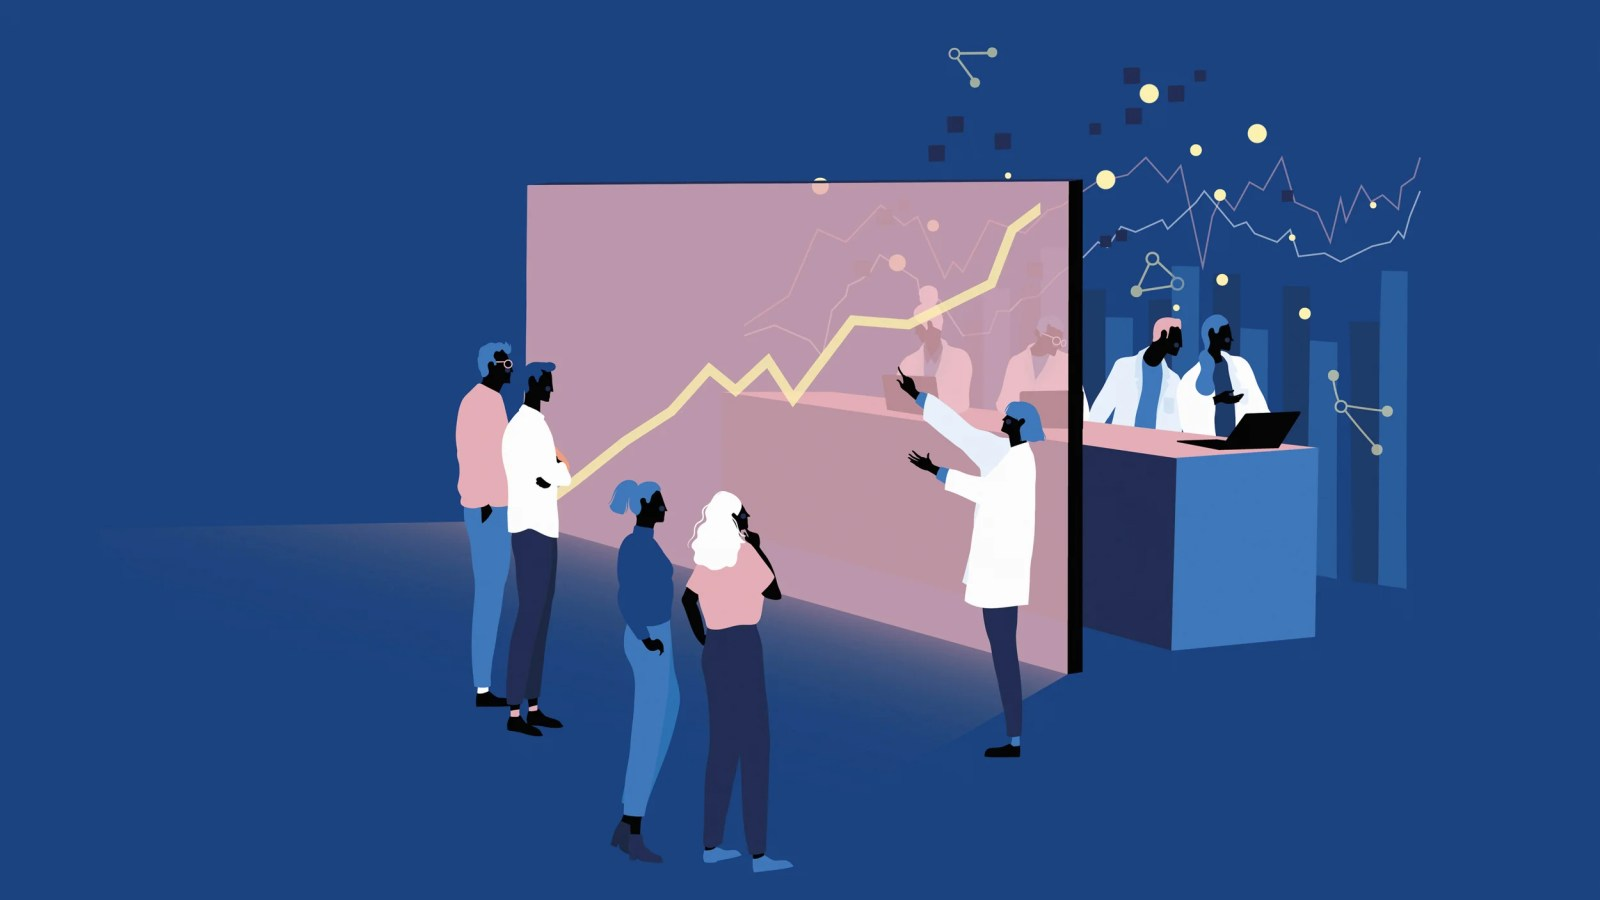 Scientists explaining data to the public